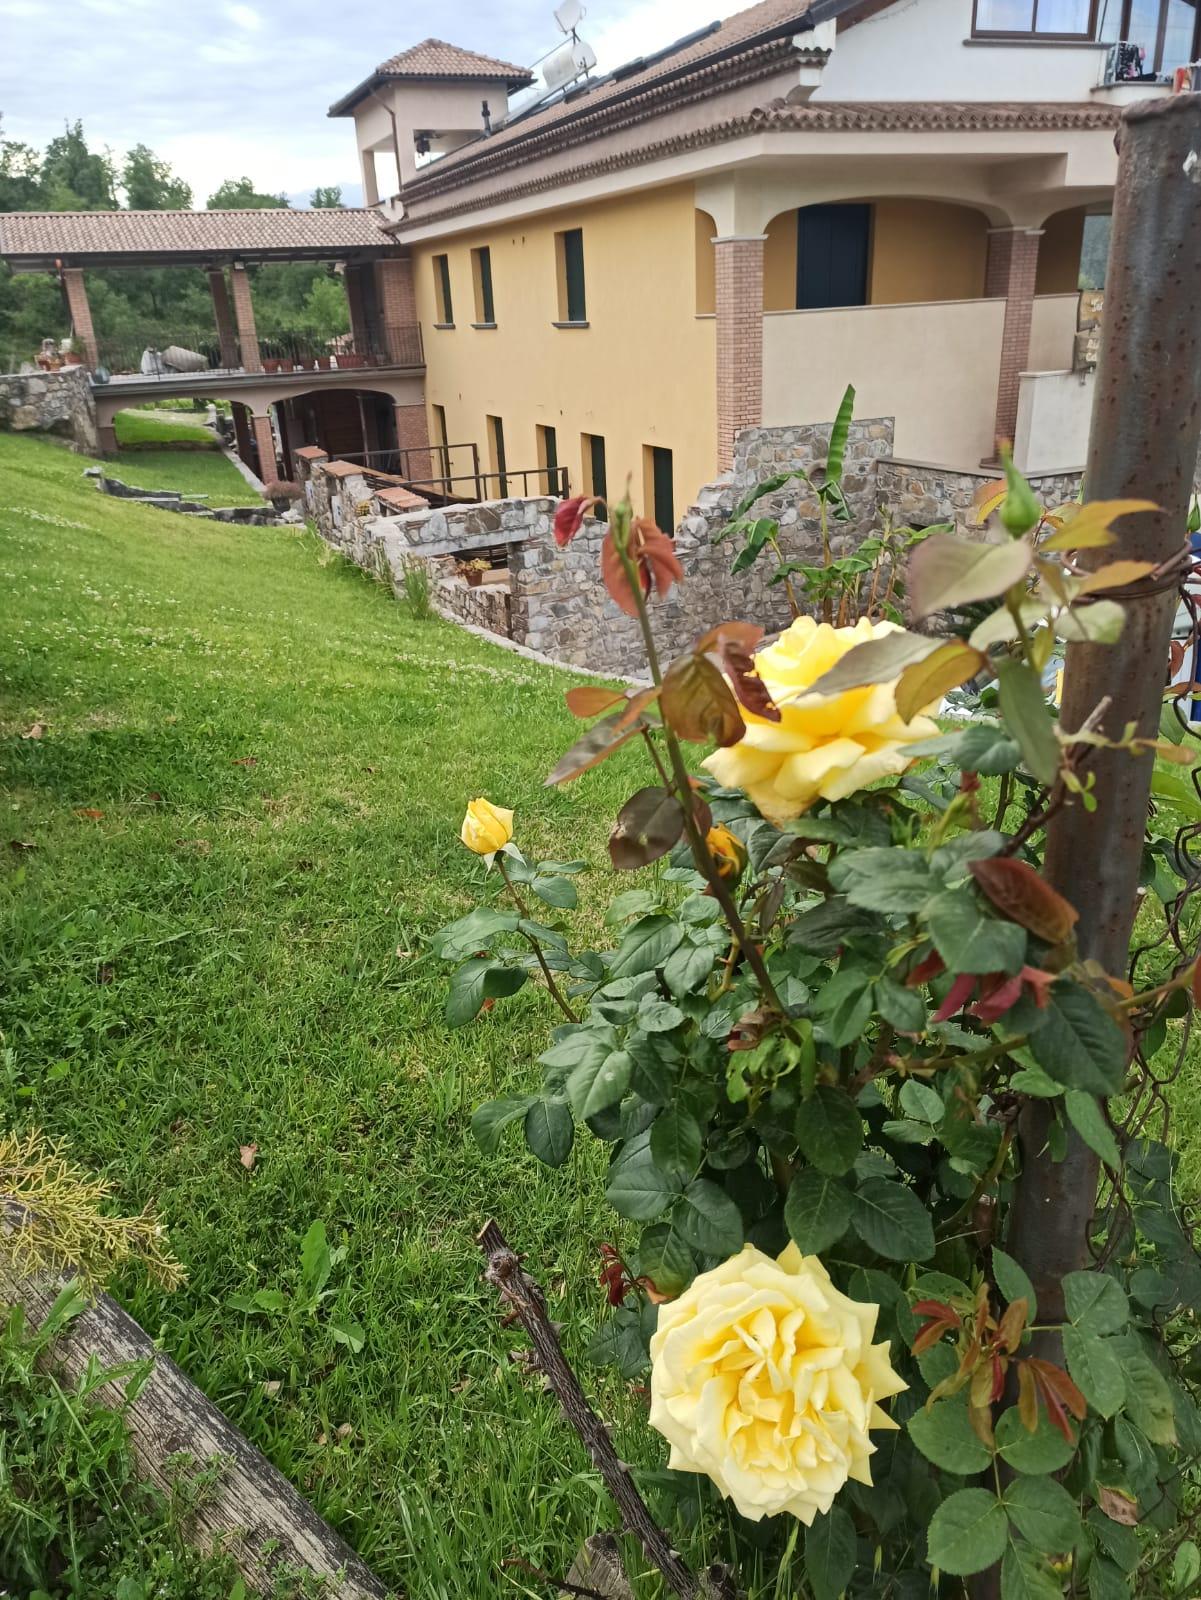 WhatsApp Image 2021-07-13 at 10.02.46 (1)tenuta_appartamenti.jpg